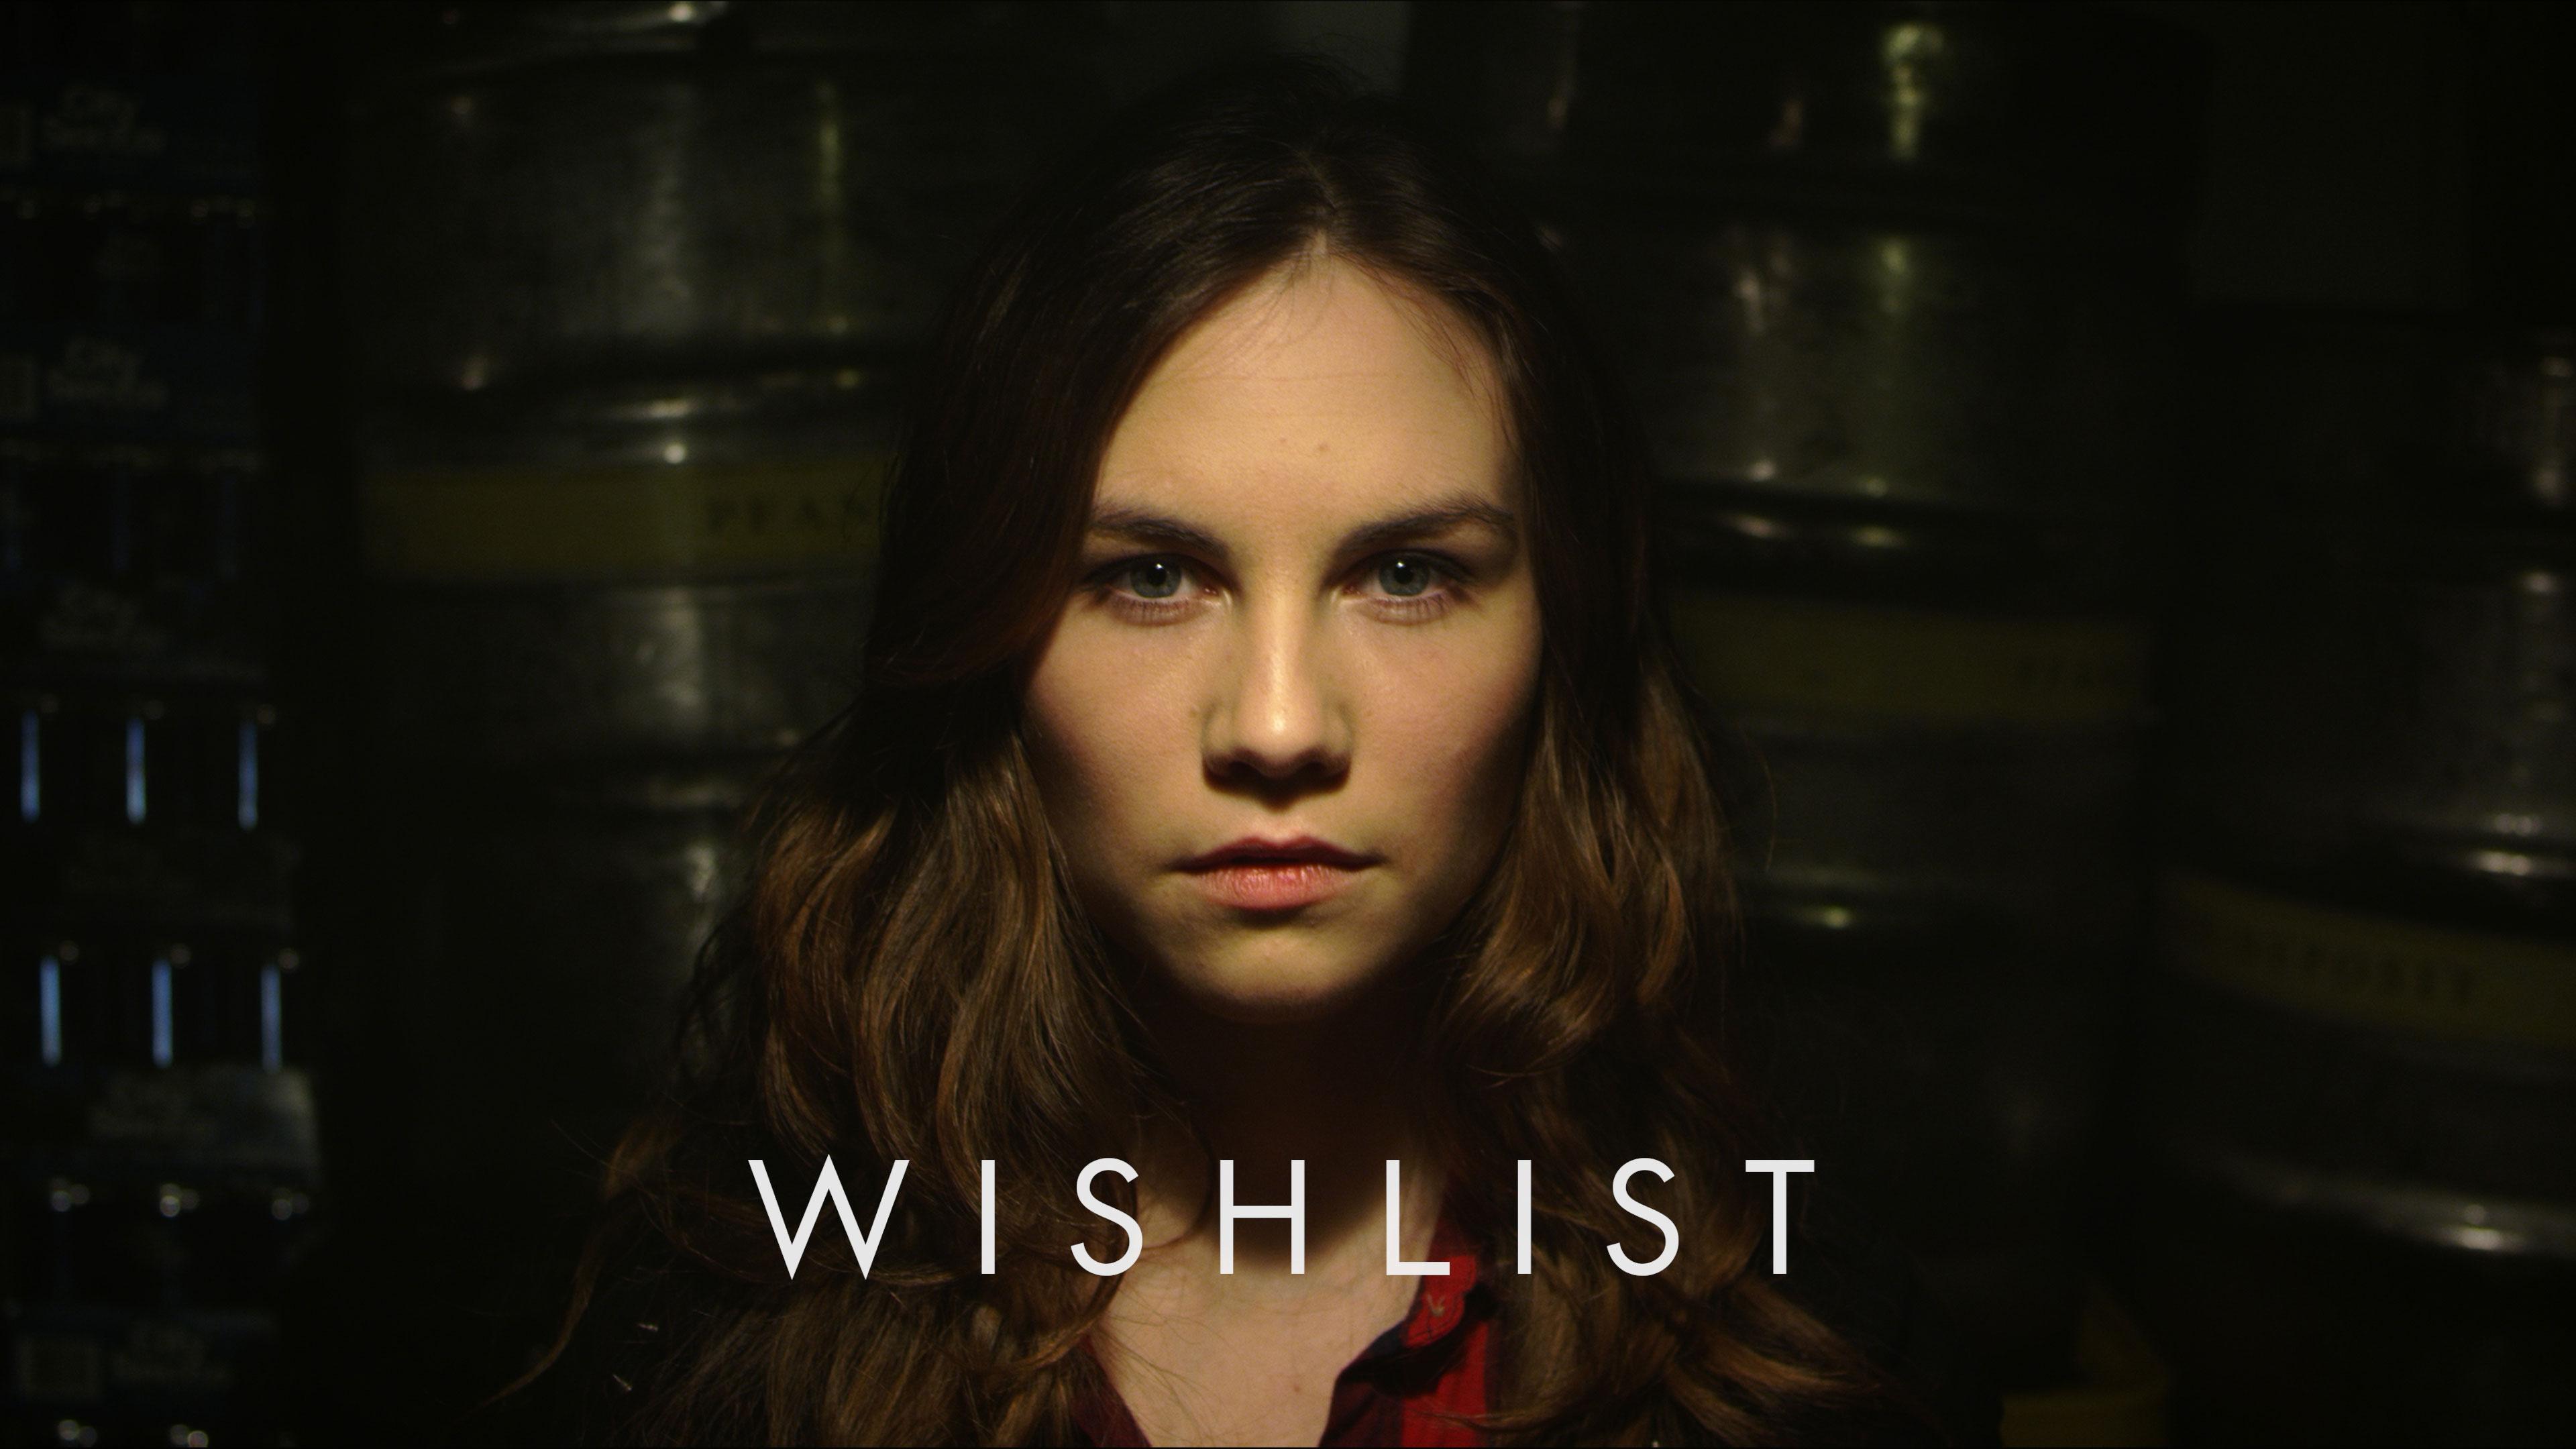 wishlist-cover-vita-tepel-c-copyright-outside-the-club-still-jpg